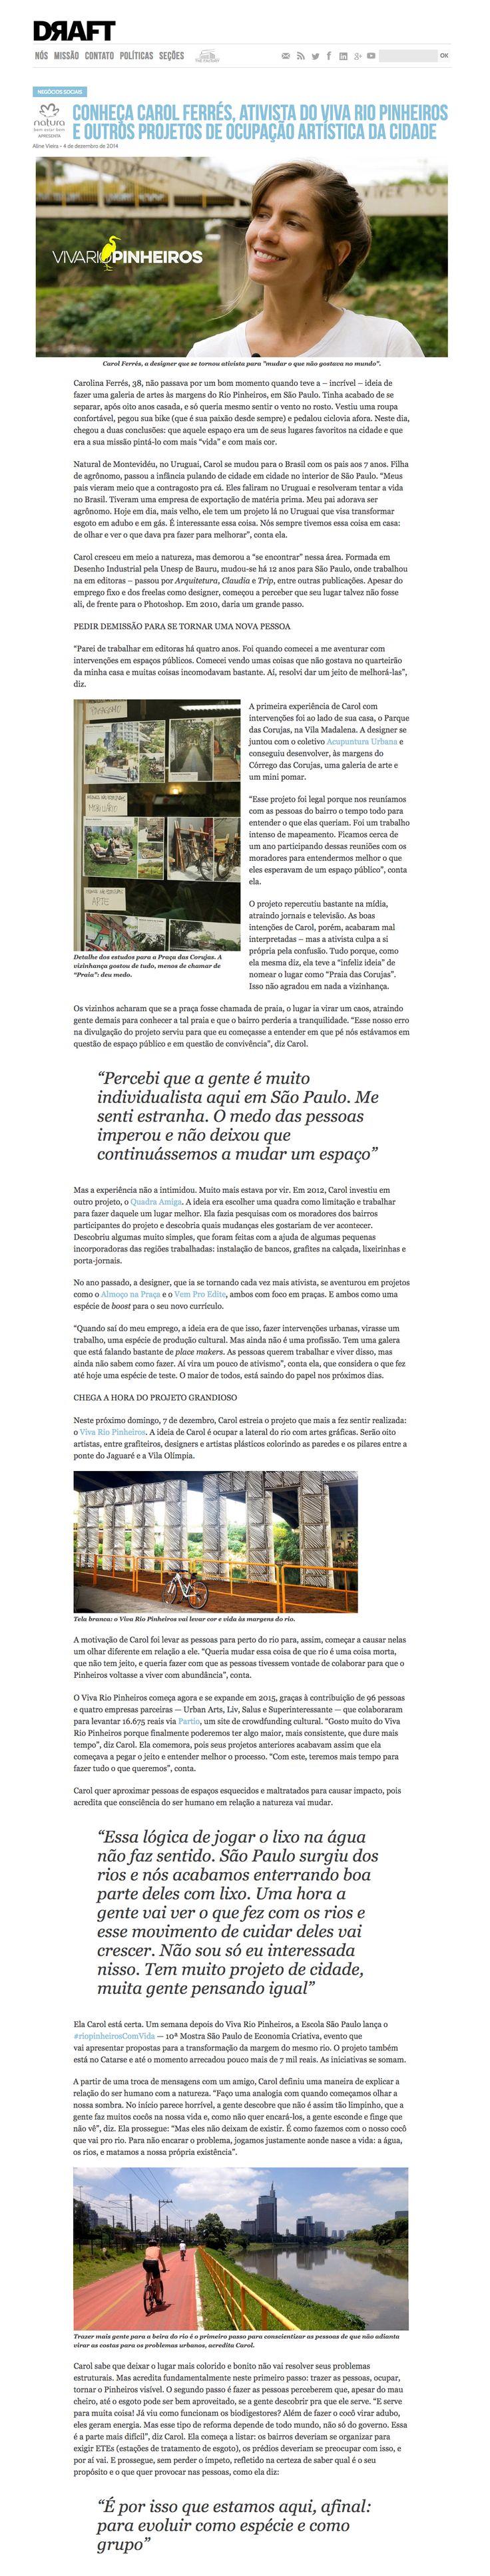 Meet Carol Ferrés, Viva Rio Pinheiros activist and other artistic occupation projects